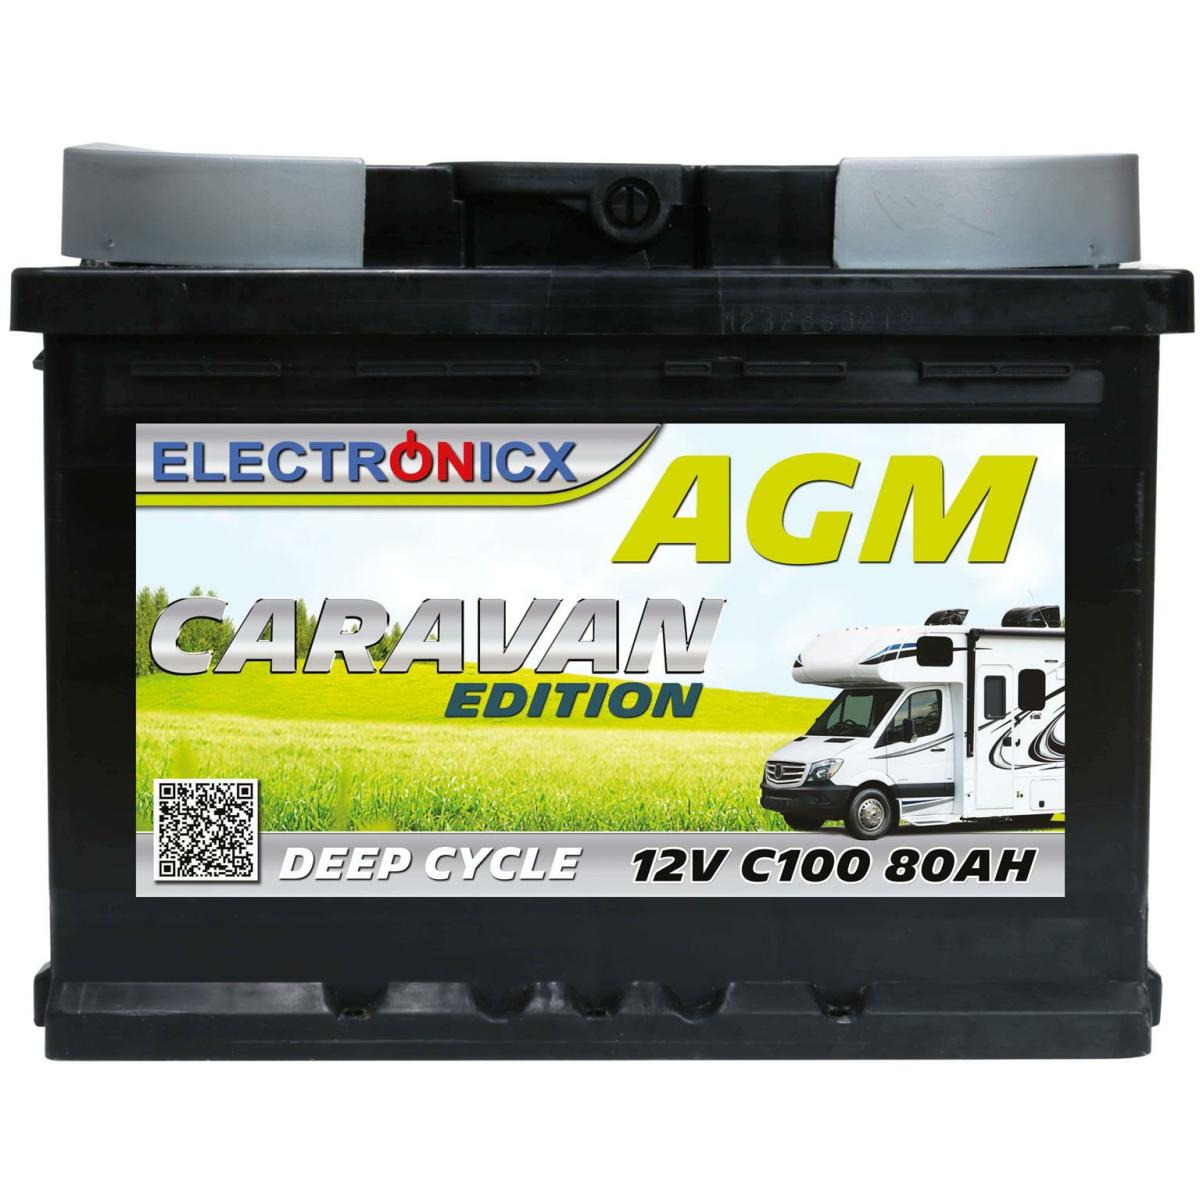 Electronicx Caravan Edition Batterie AGM 80 AH 12V Wohnmobil Boot Versorgung…